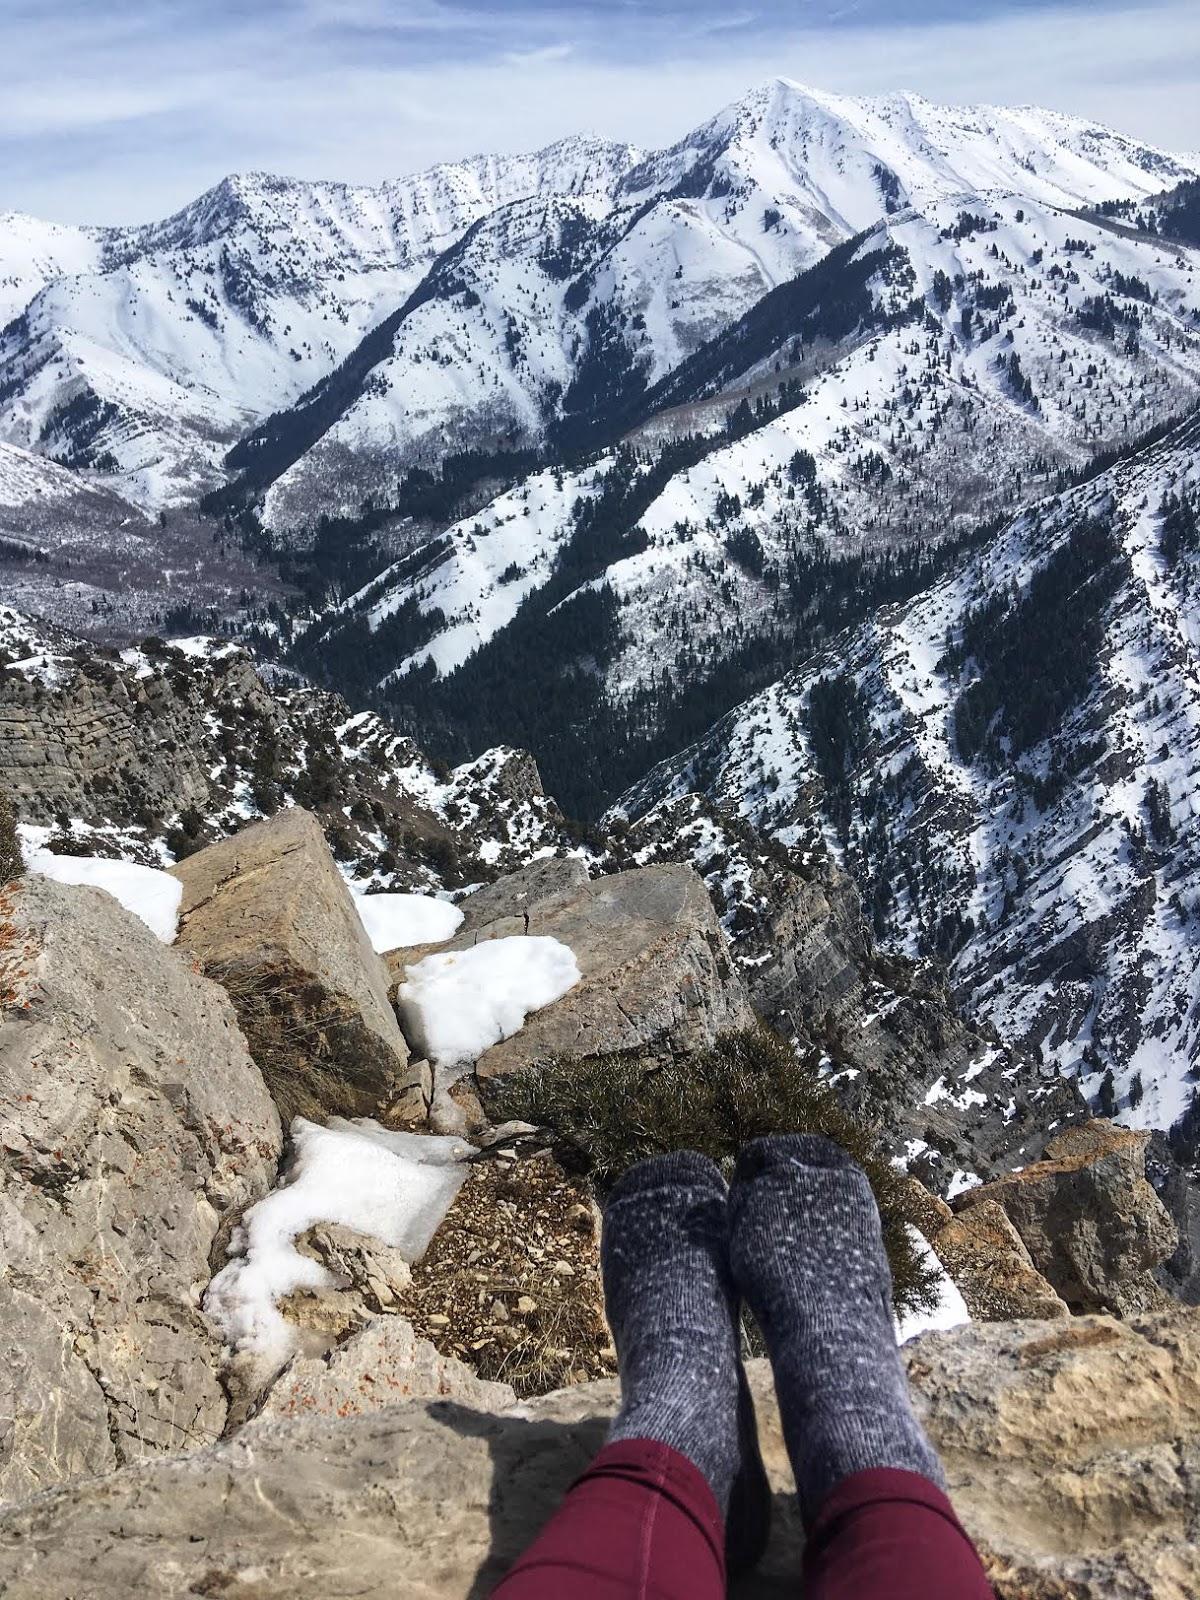 Hiking to Squaw Peak, Utah County, Hiking in Utah with Dogs